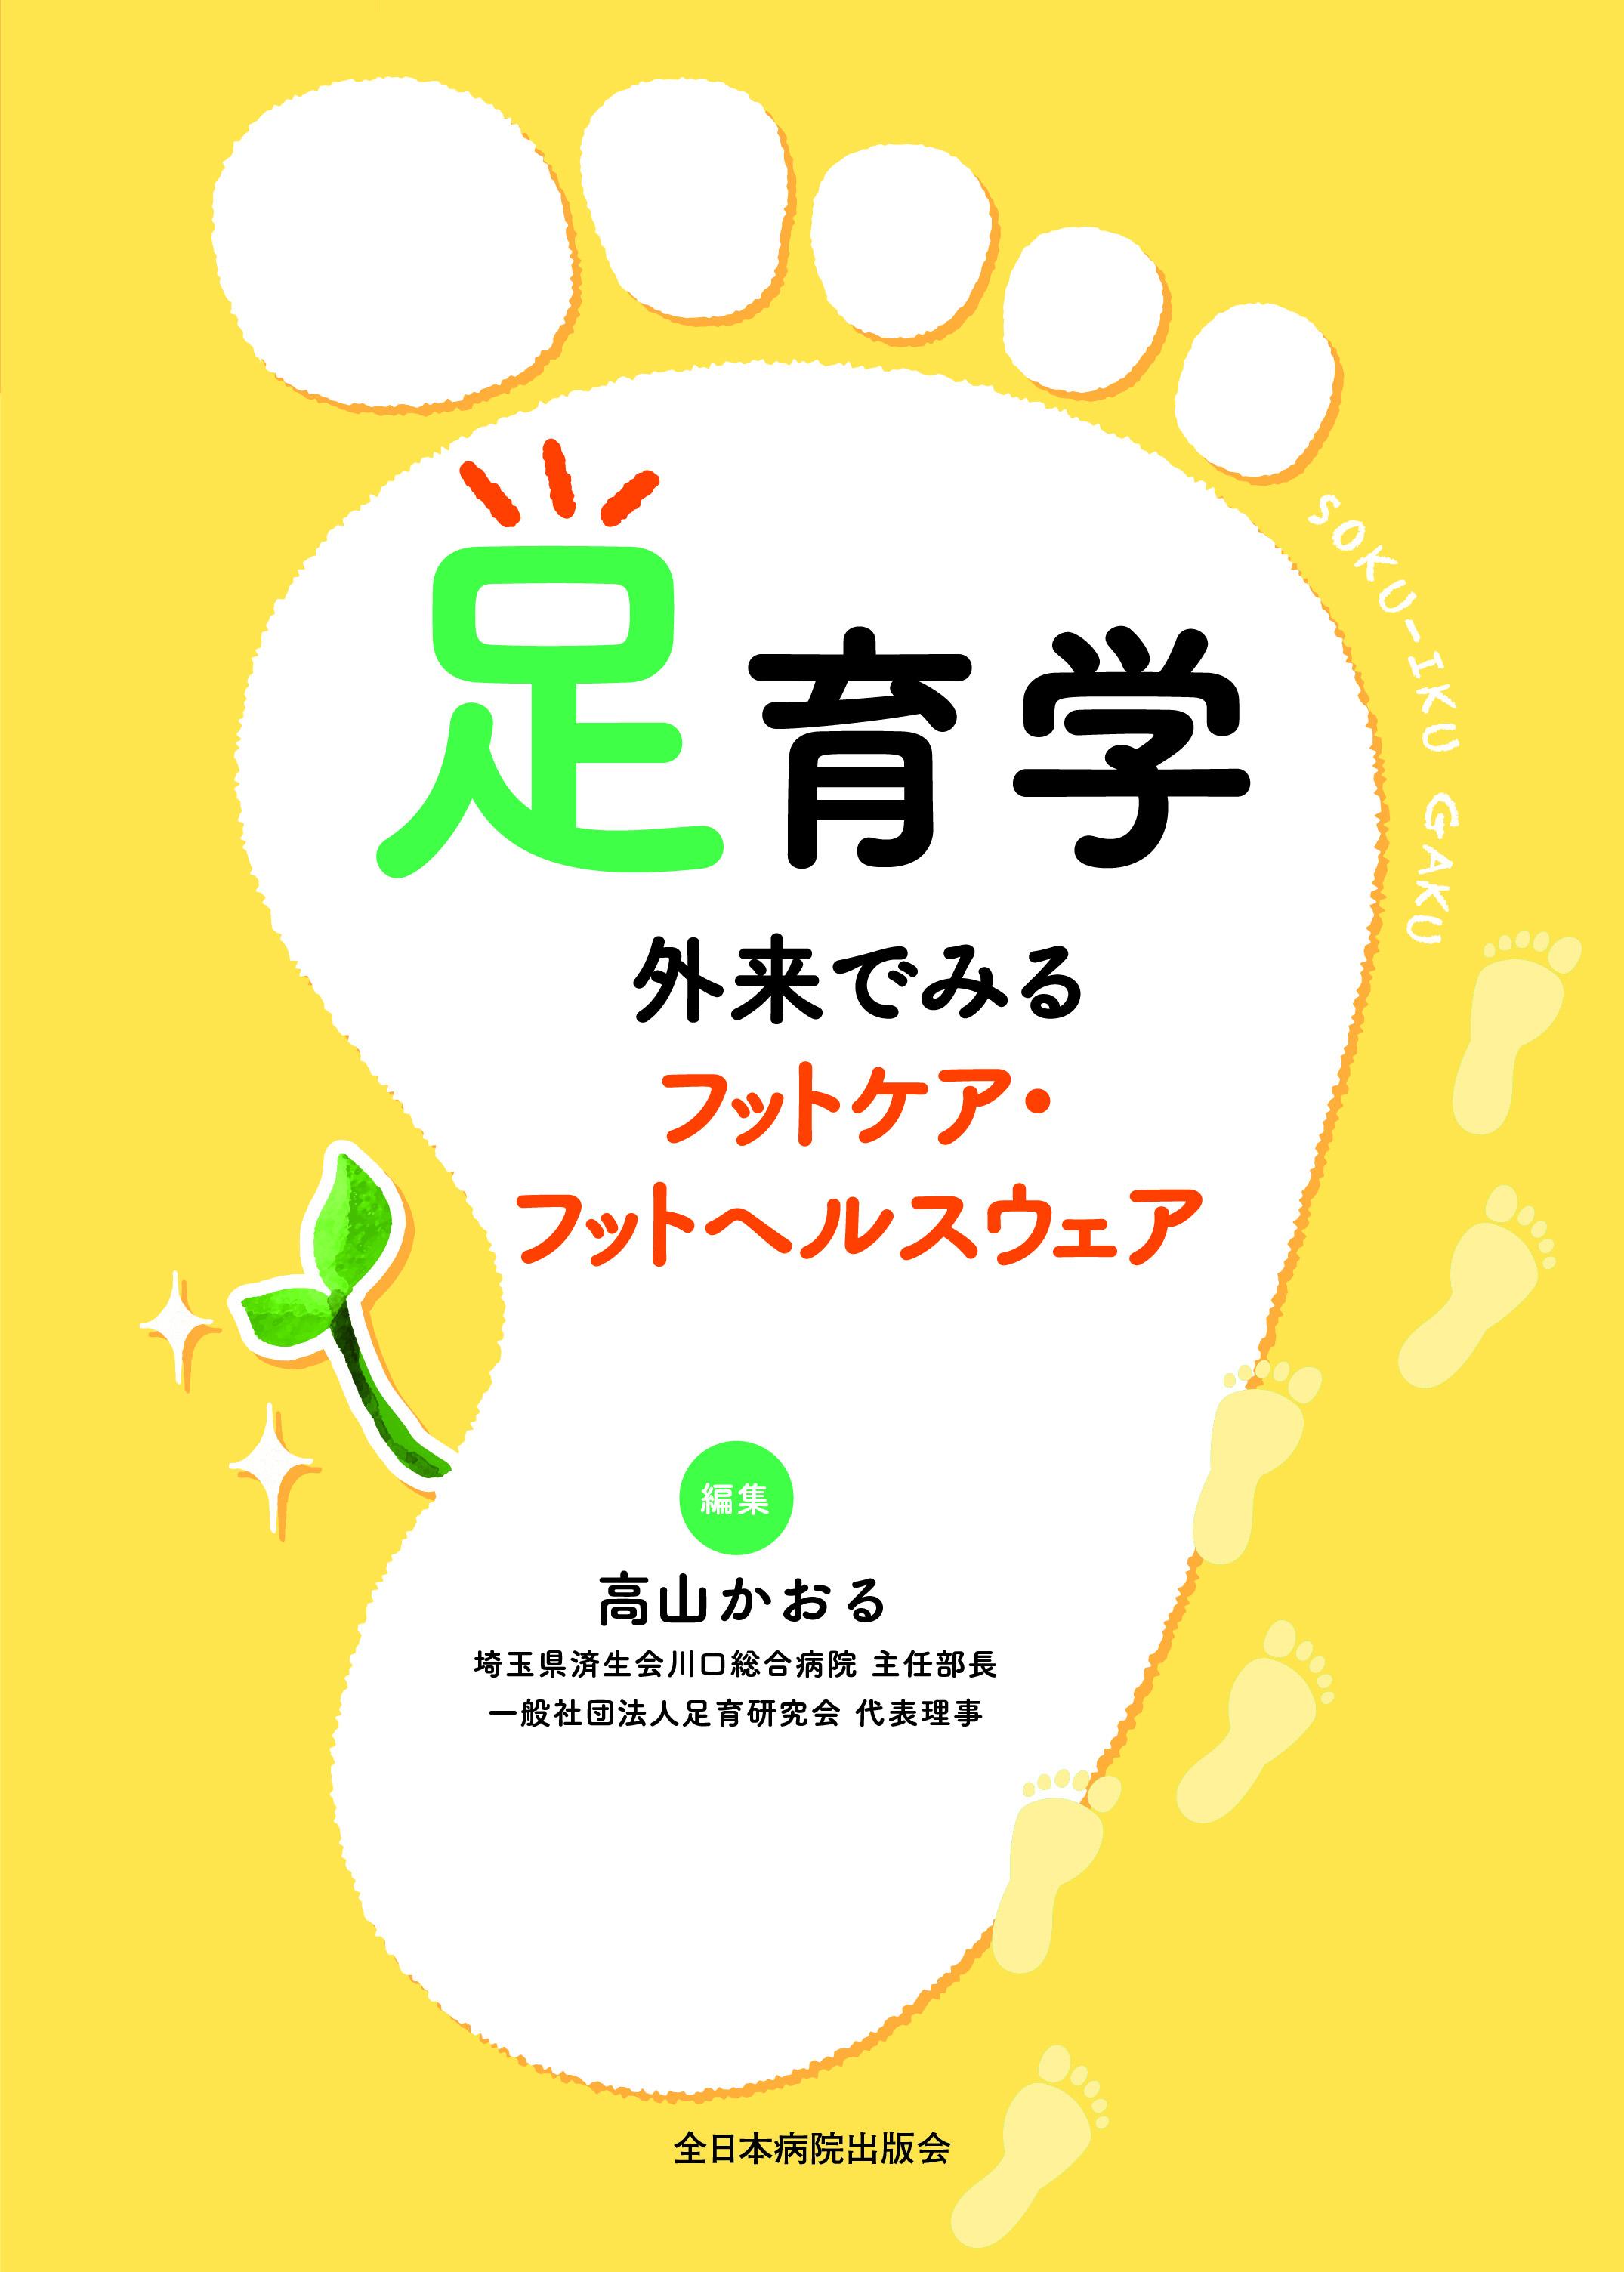 http://www.sokuiku.jp/photo/ashiikugaku.jpg